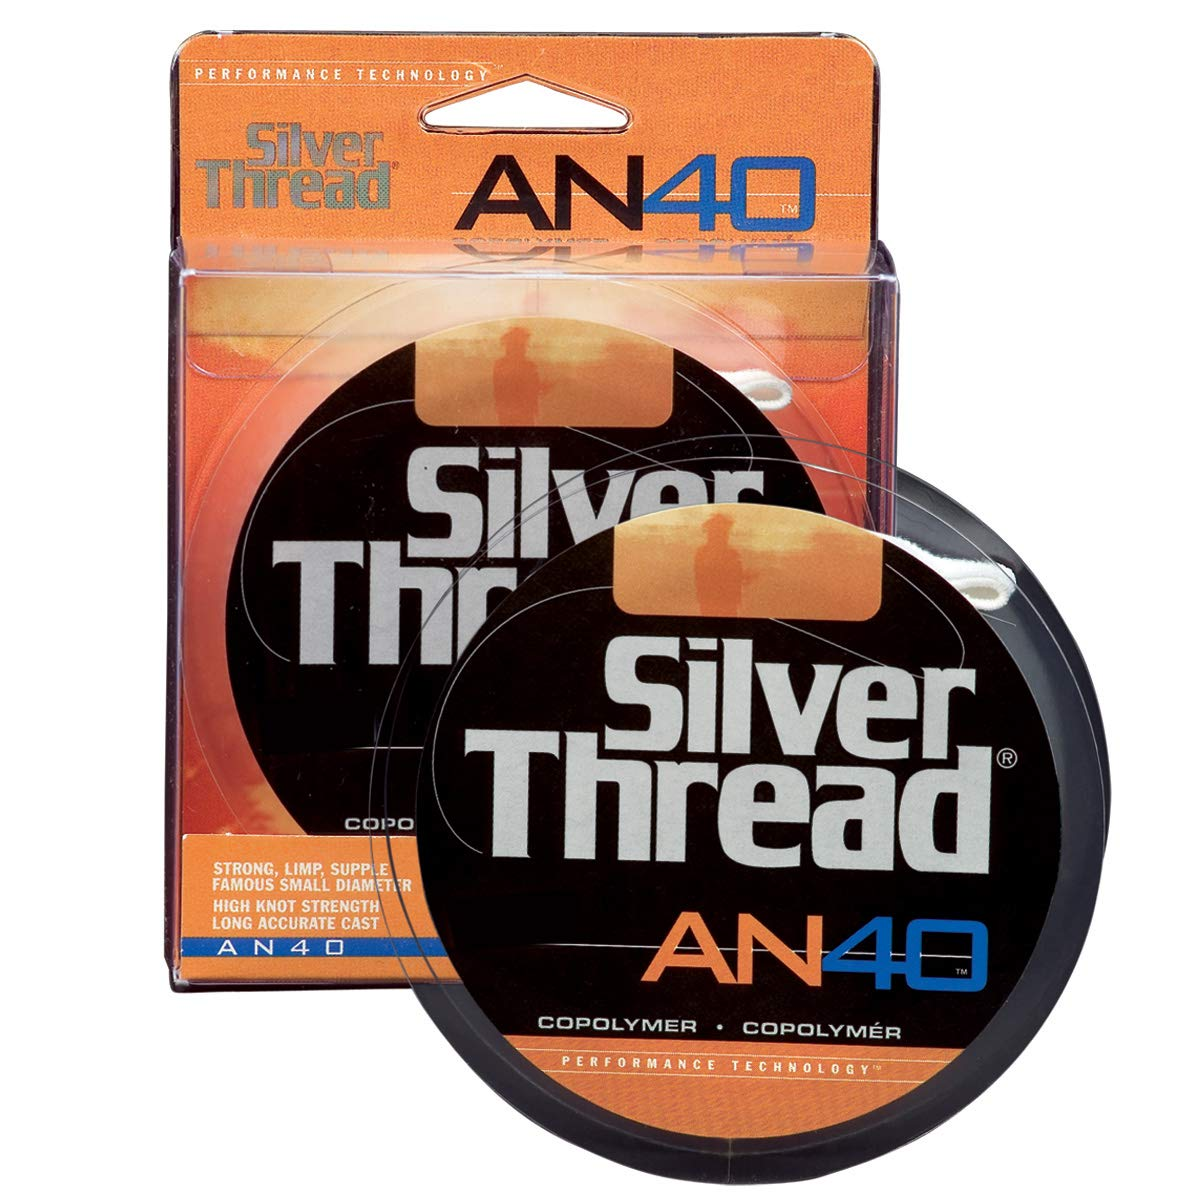 Pradco Silver Thread AN40 Filler Spool Fishing Line-300 Yards Green, 10-Pound Test